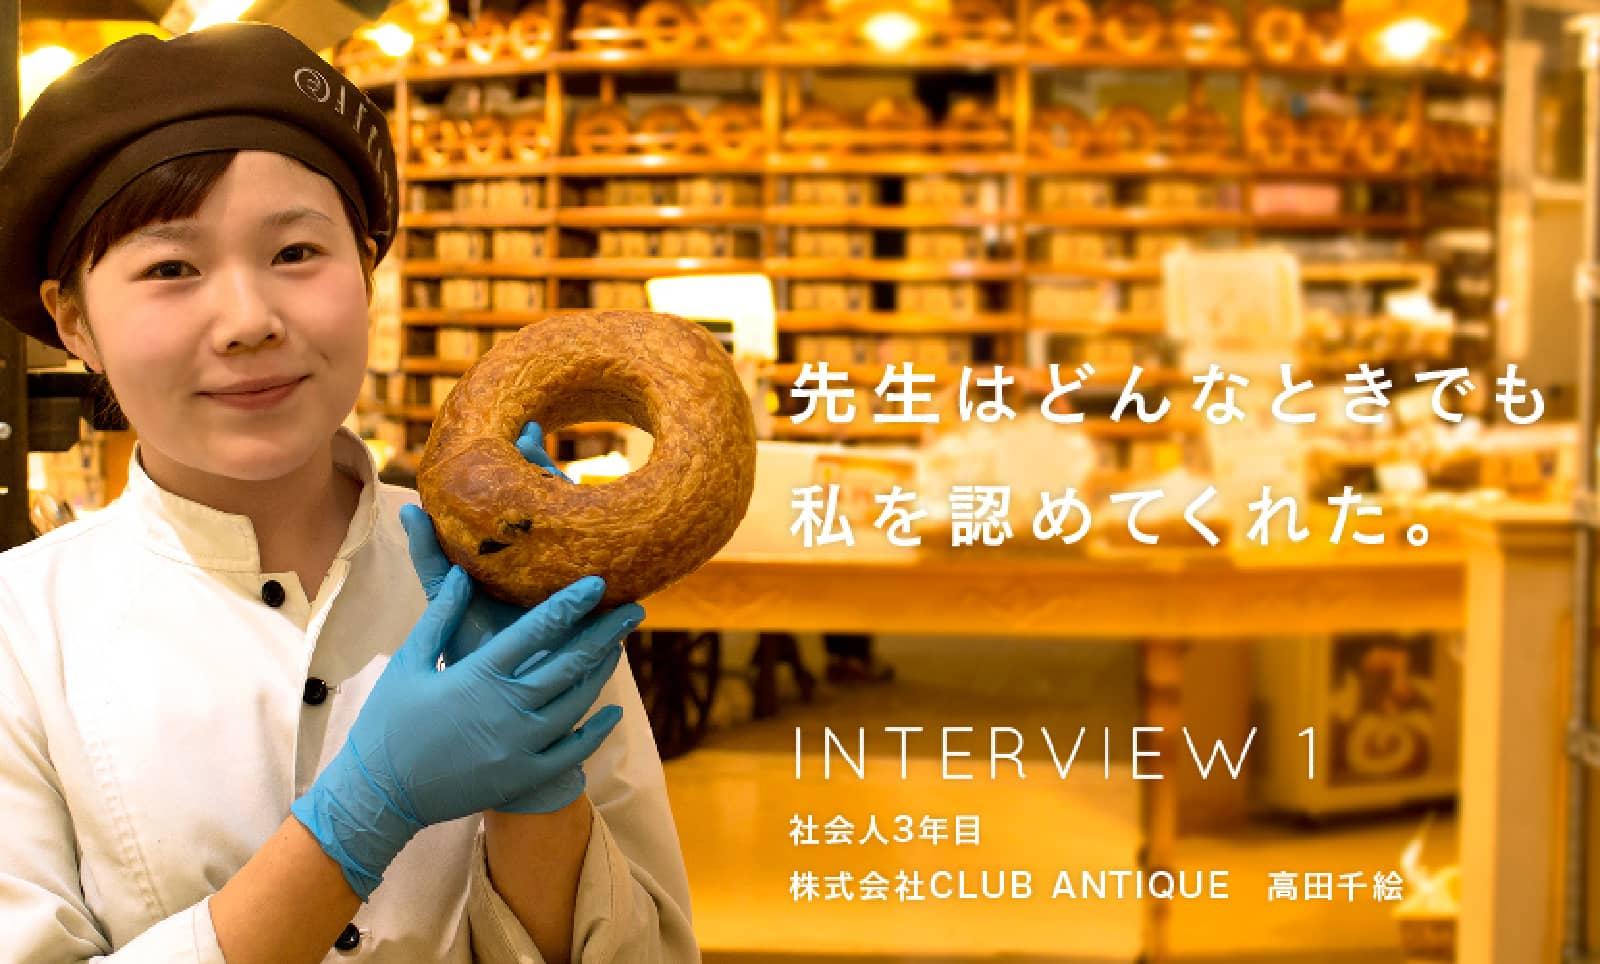 INTERVIEW 01 社会人3年目 株式会社CLUB ANTIQUE 高田千絵さん